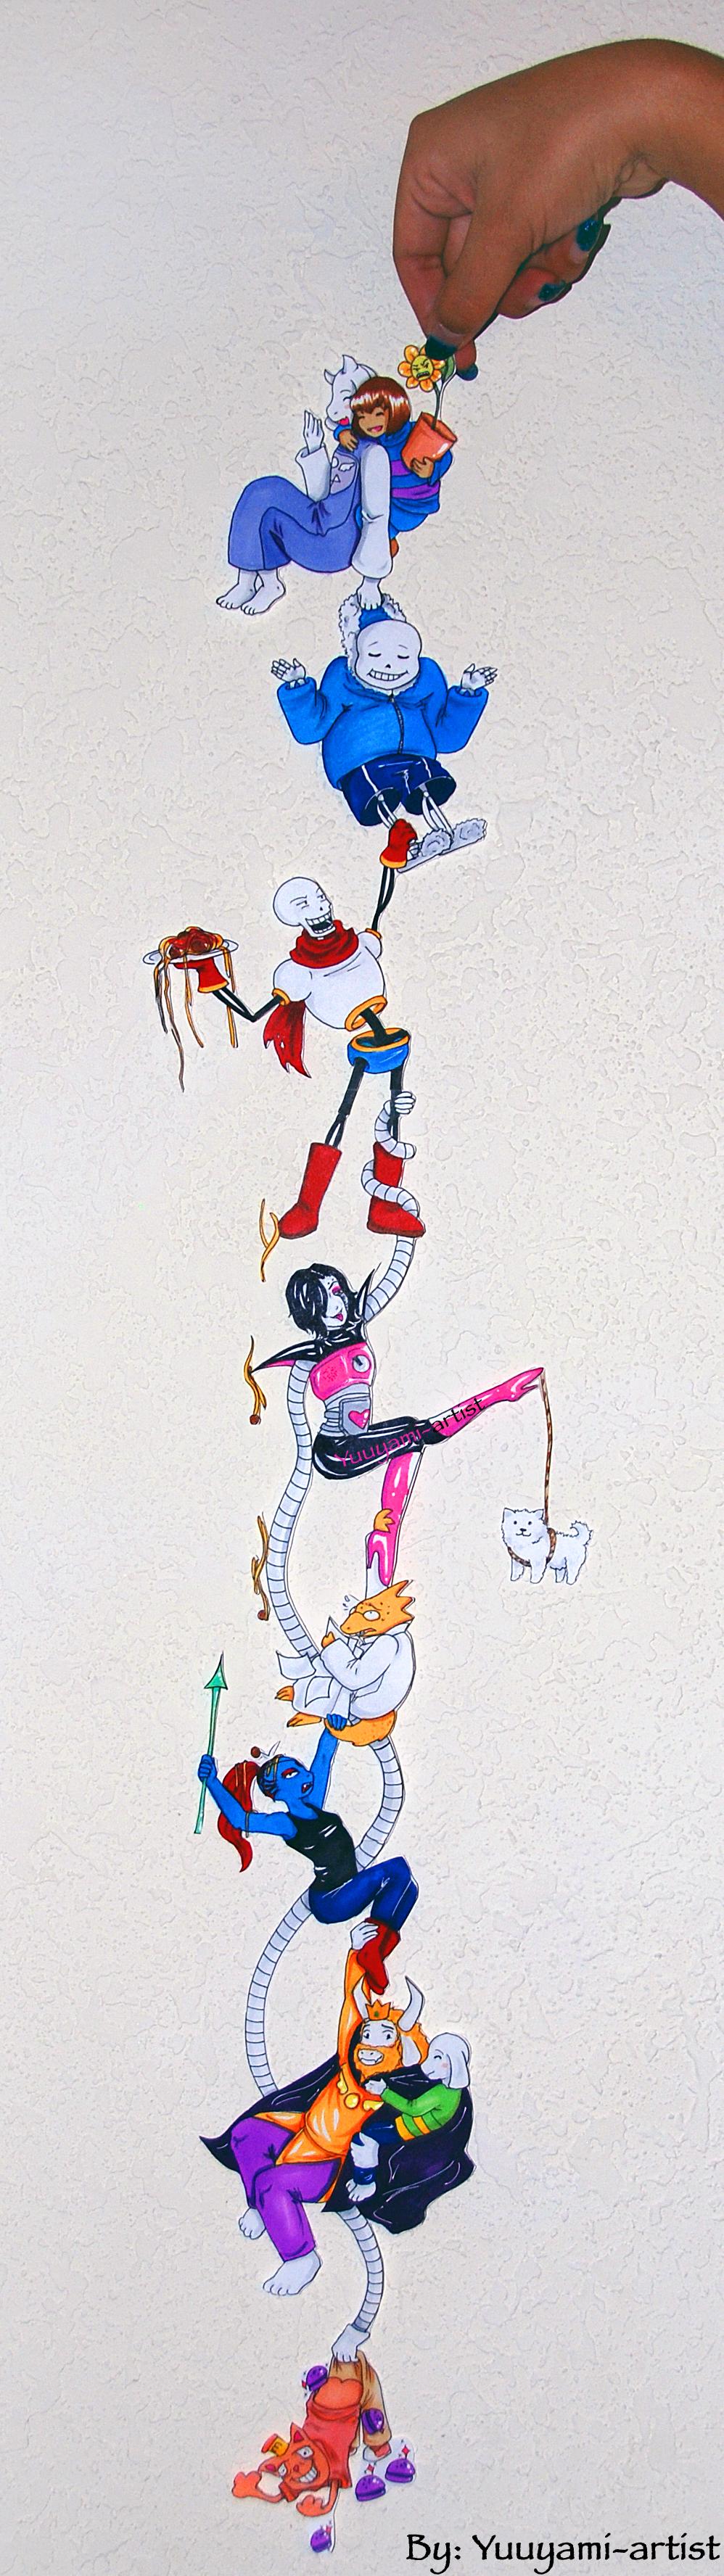 Undertale - Chibi Chain by yuuyami-artist